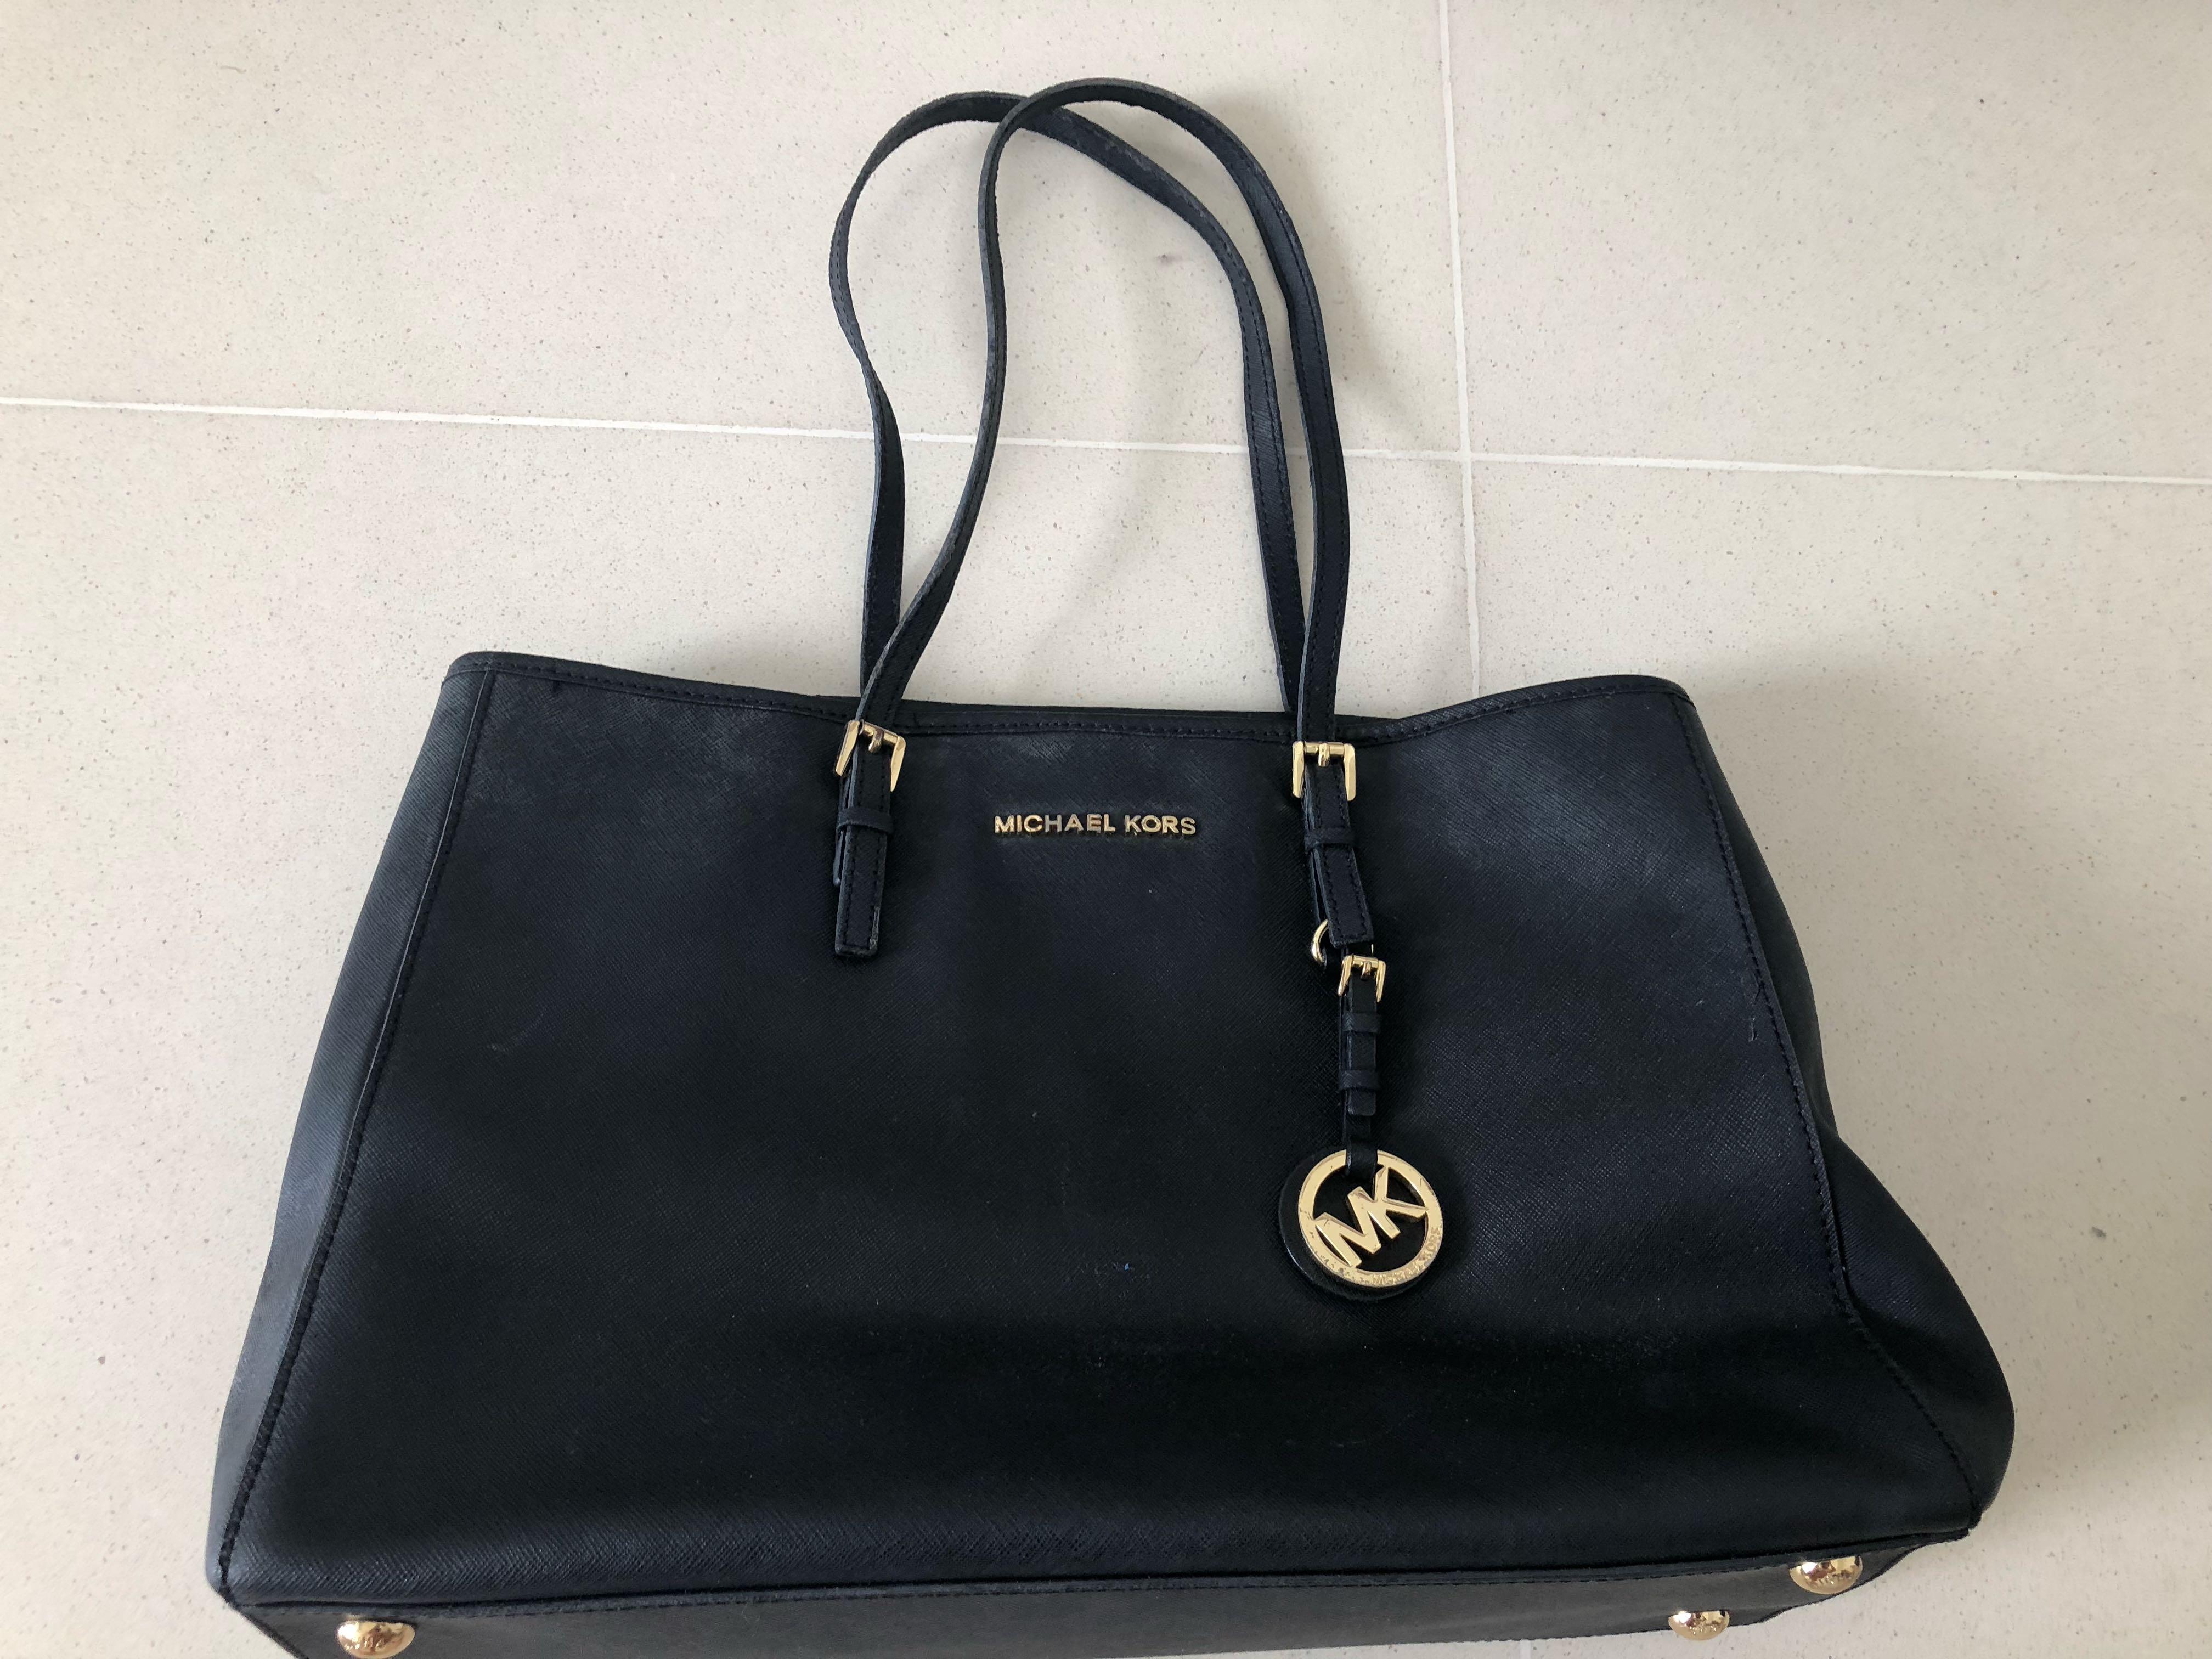 3d5a07242ec3 Home · Women's Fashion · Bags & Wallets · Handbags. photo photo photo